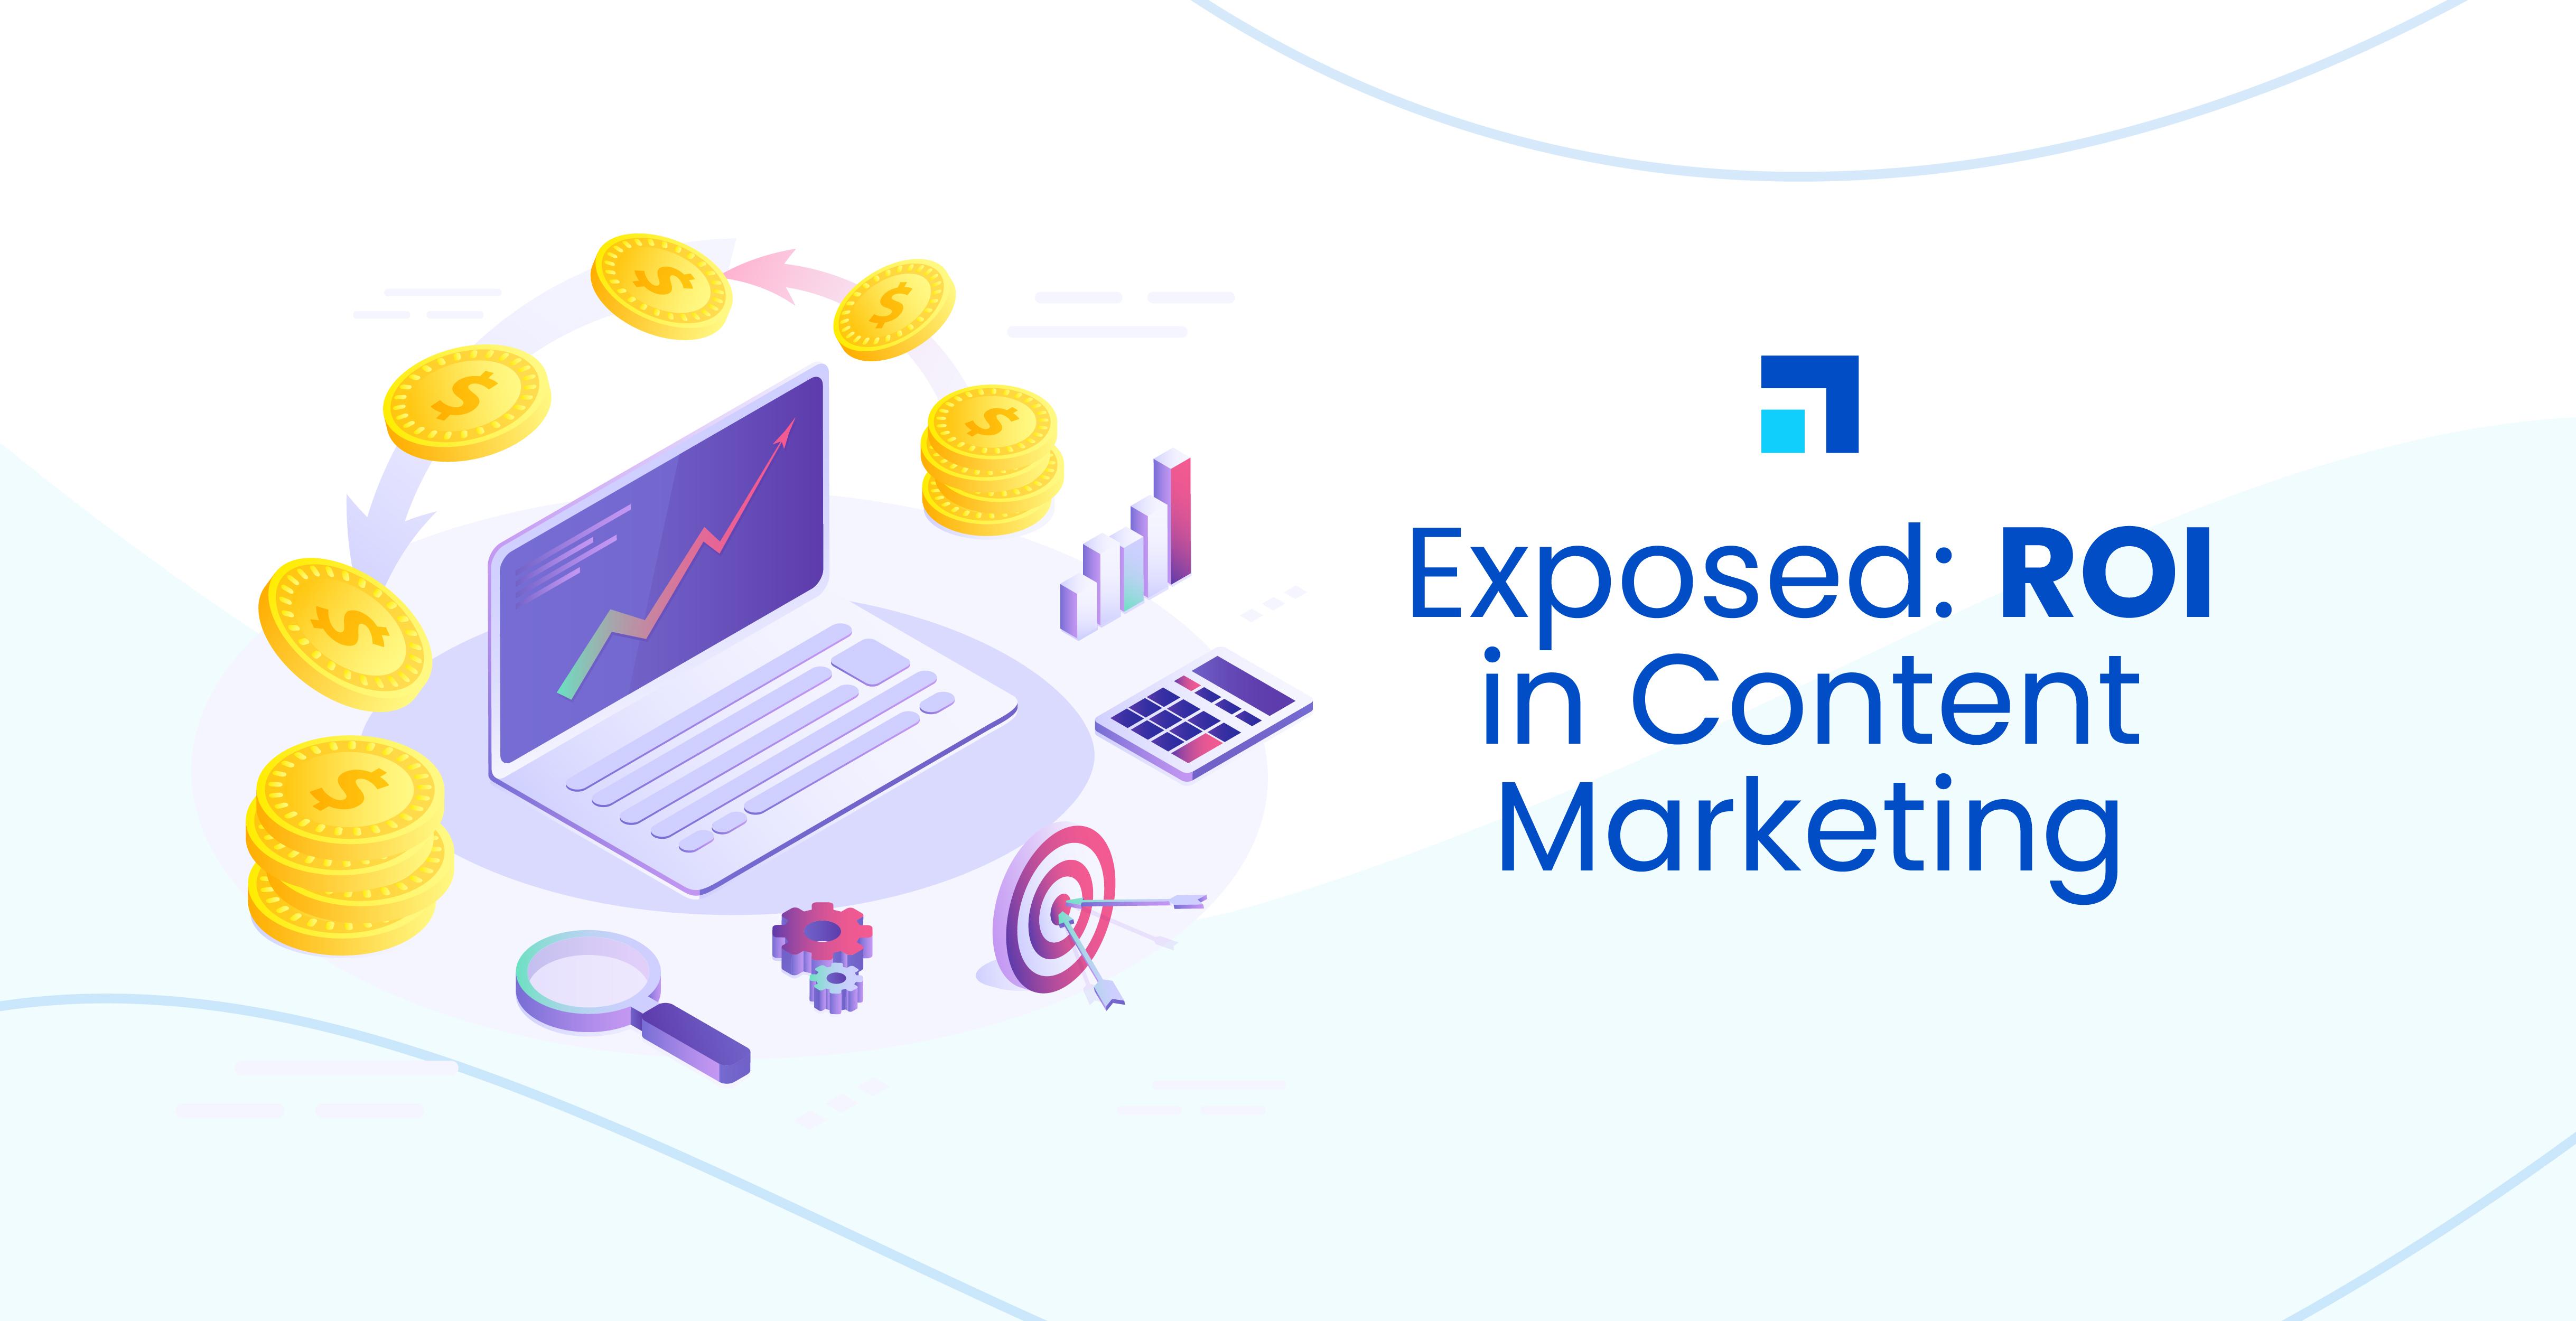 Exposed: ROI in Content Marketing